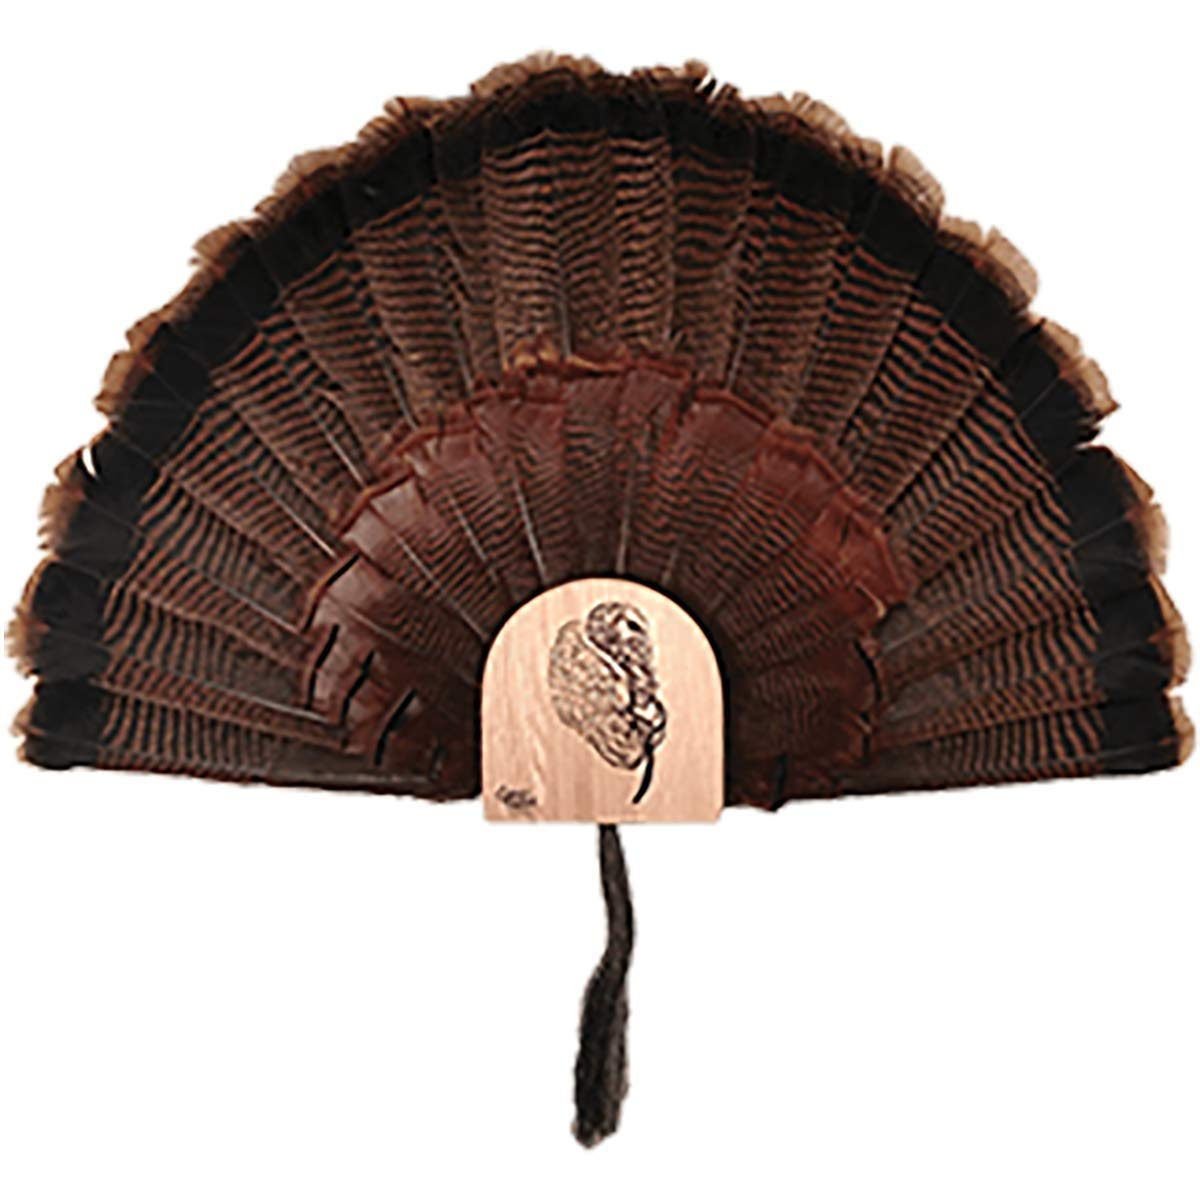 Quaker Boy Turkey Thugs Fan Mount 5 Beard Holder Abu Garcia 99801 170822-760299